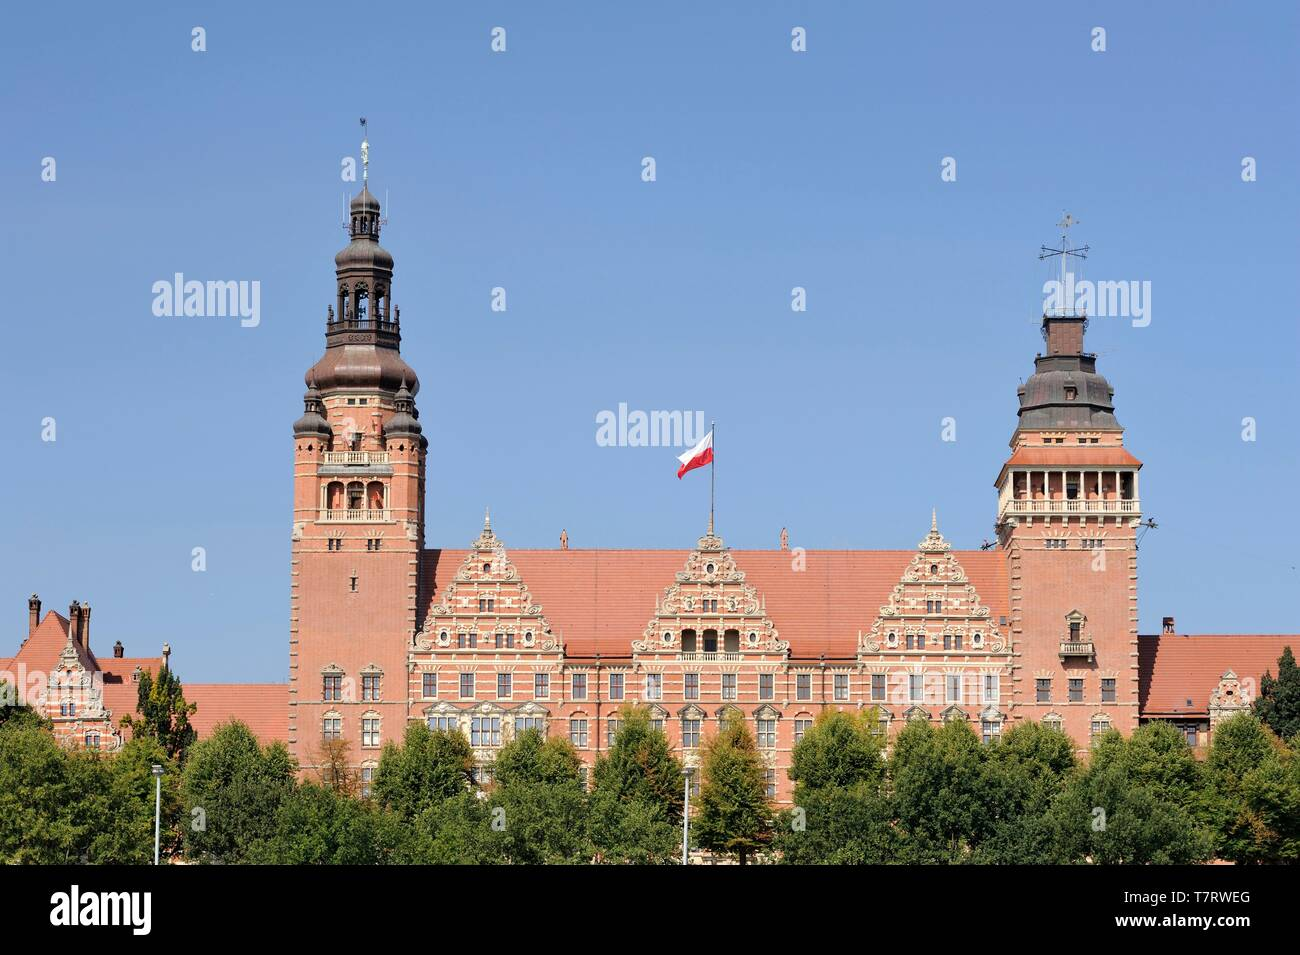 Poland, West Pomeranian, Szczecin, the Chrobry ramparts named from Boleslaw I the Brave, the first Polish king, Boleslaw I Chrobry, head of the department (West Pomeranian Voivodeship) Stock Photo